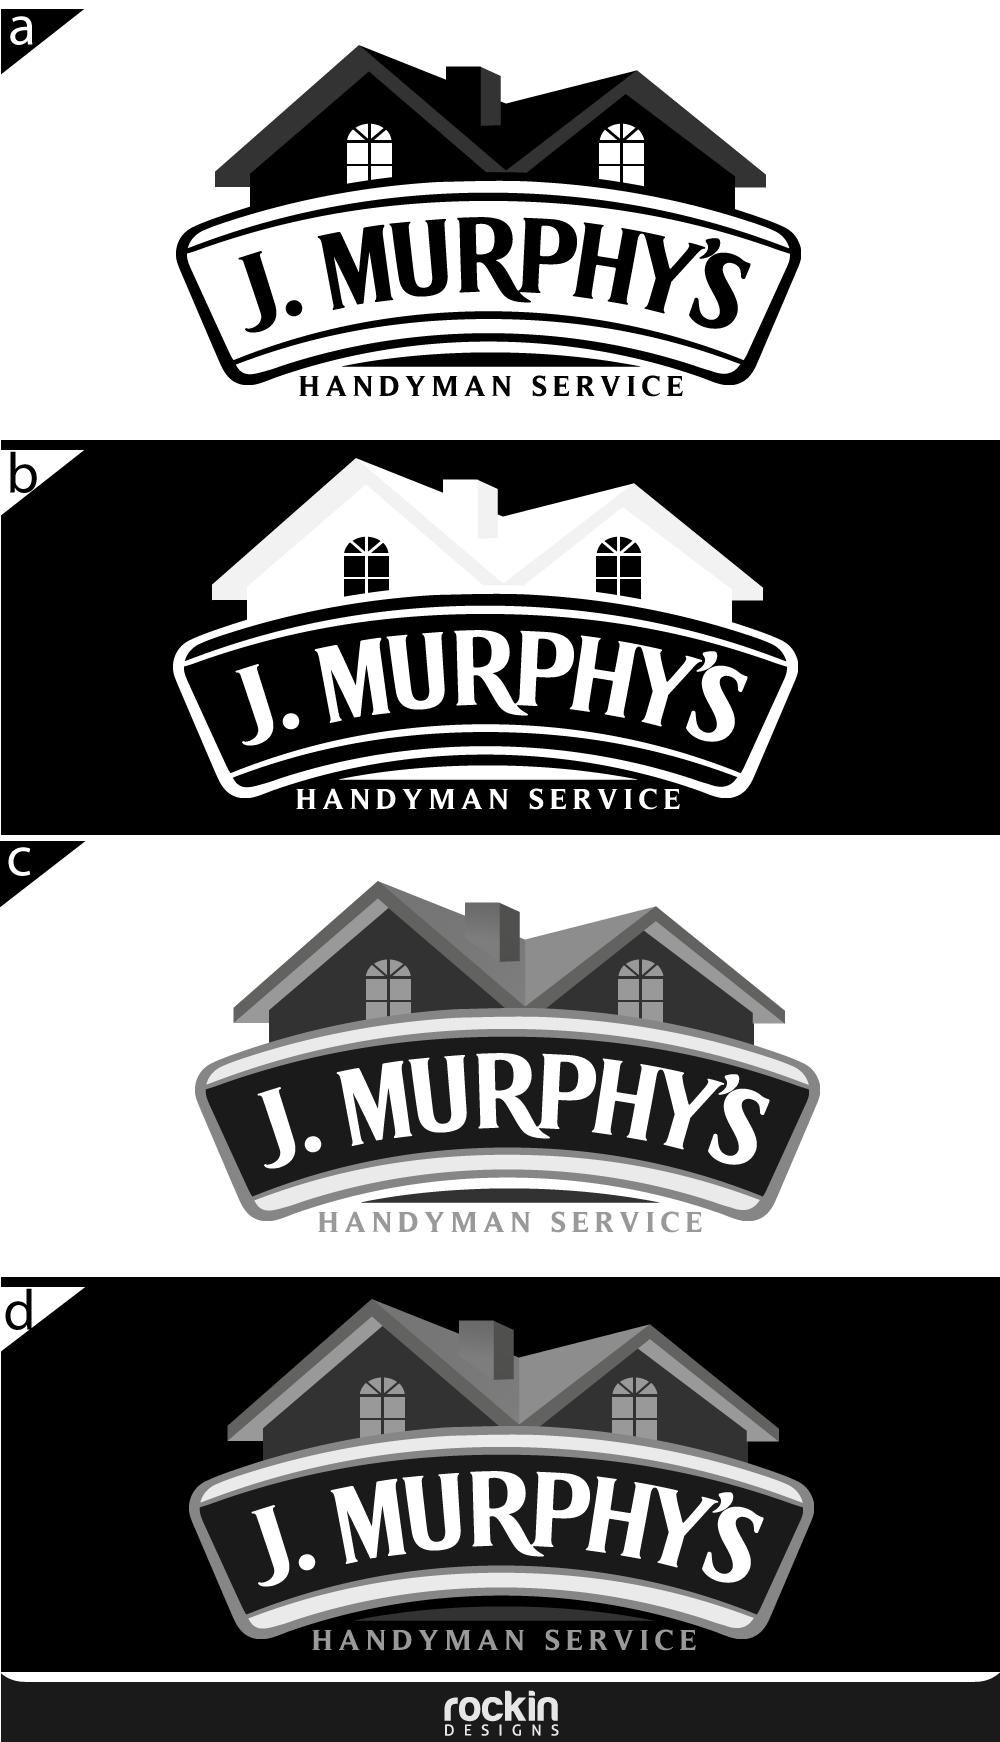 Logo Design by rockin - Entry No. 102 in the Logo Design Contest J. Murphy's Renovations Logo Design.